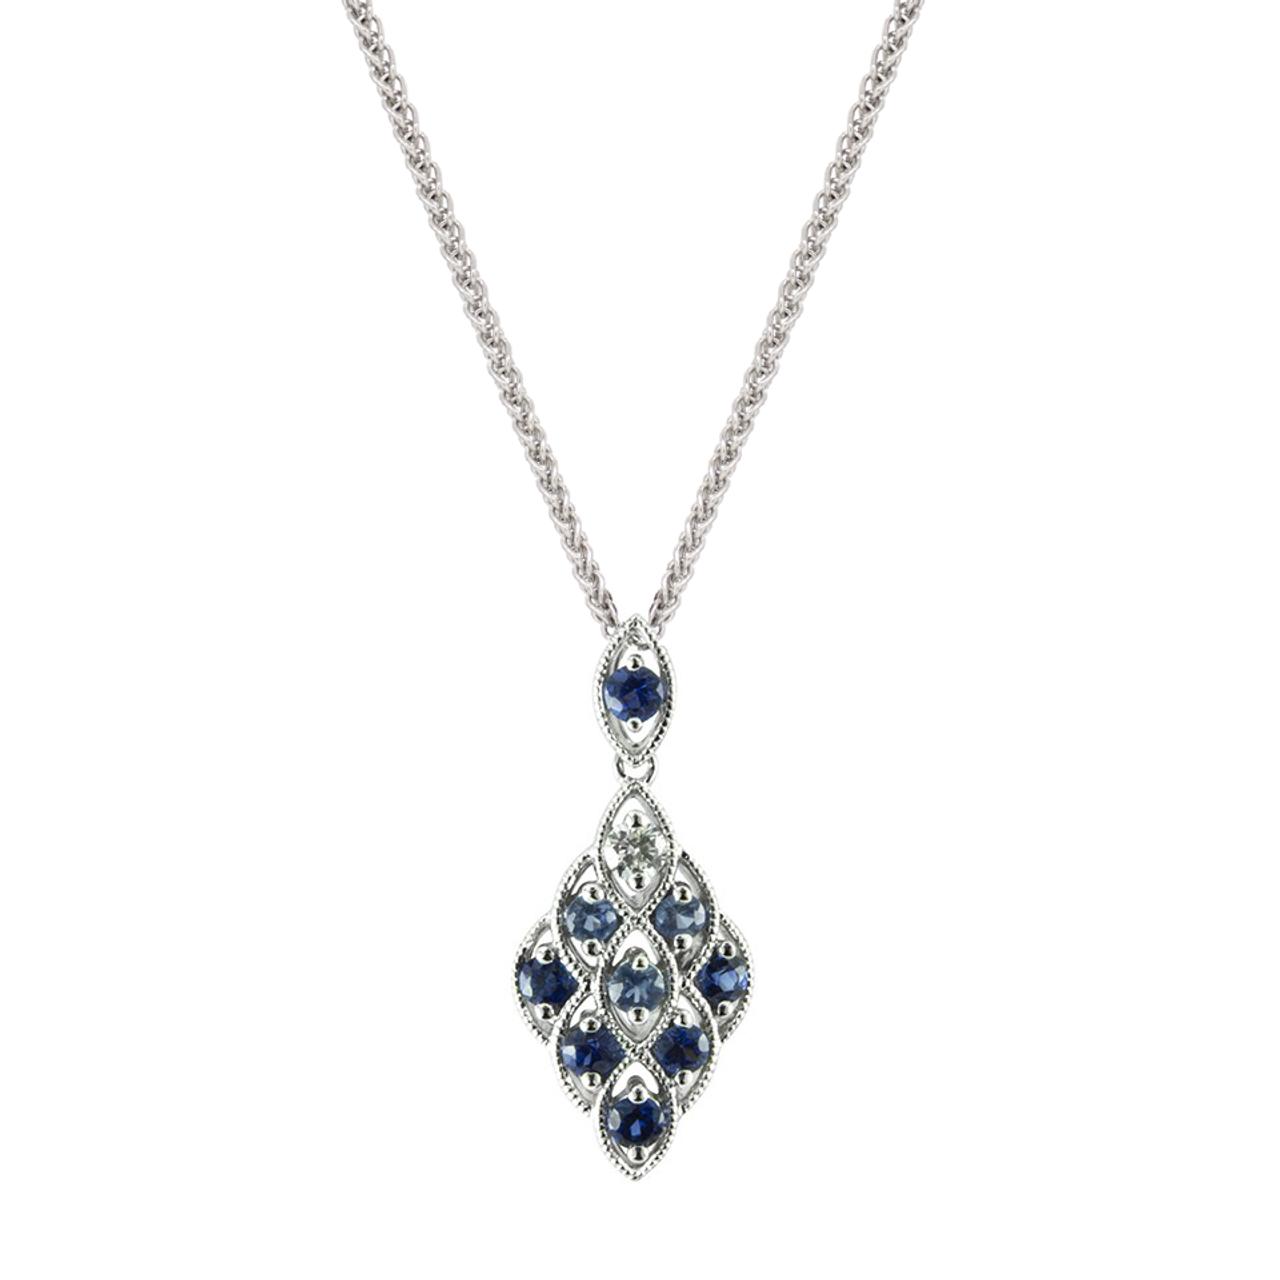 18ct White Gold Sapphire & Diamond Lace Pendant & Chain